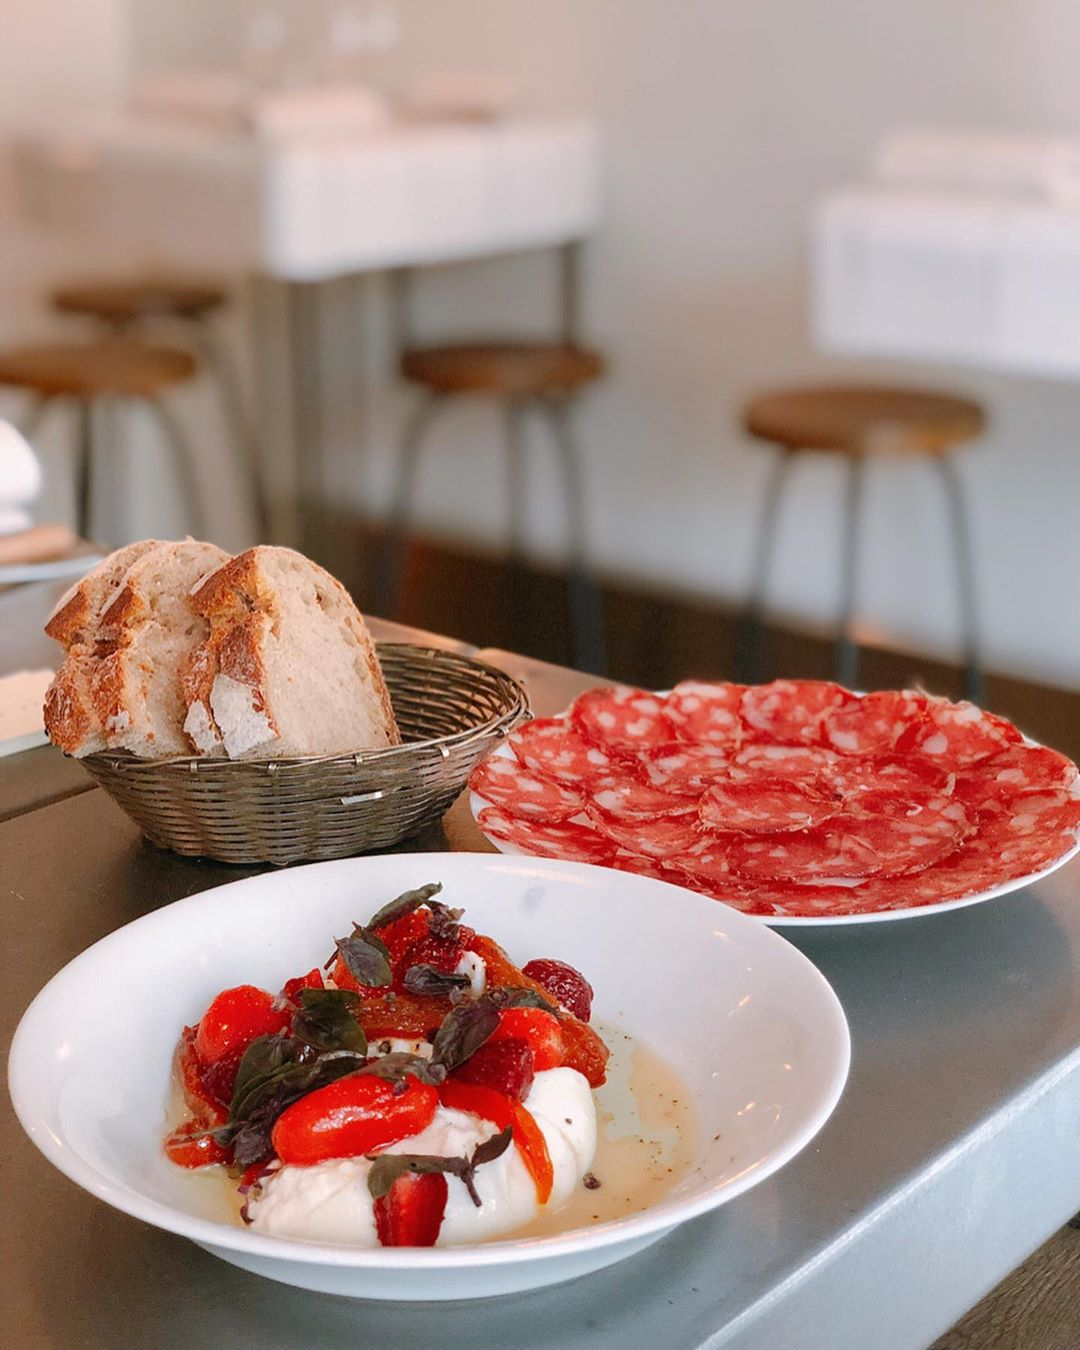 restaurant batignolles lesbatignolles paris 17 blog food coretta saint valentin diner